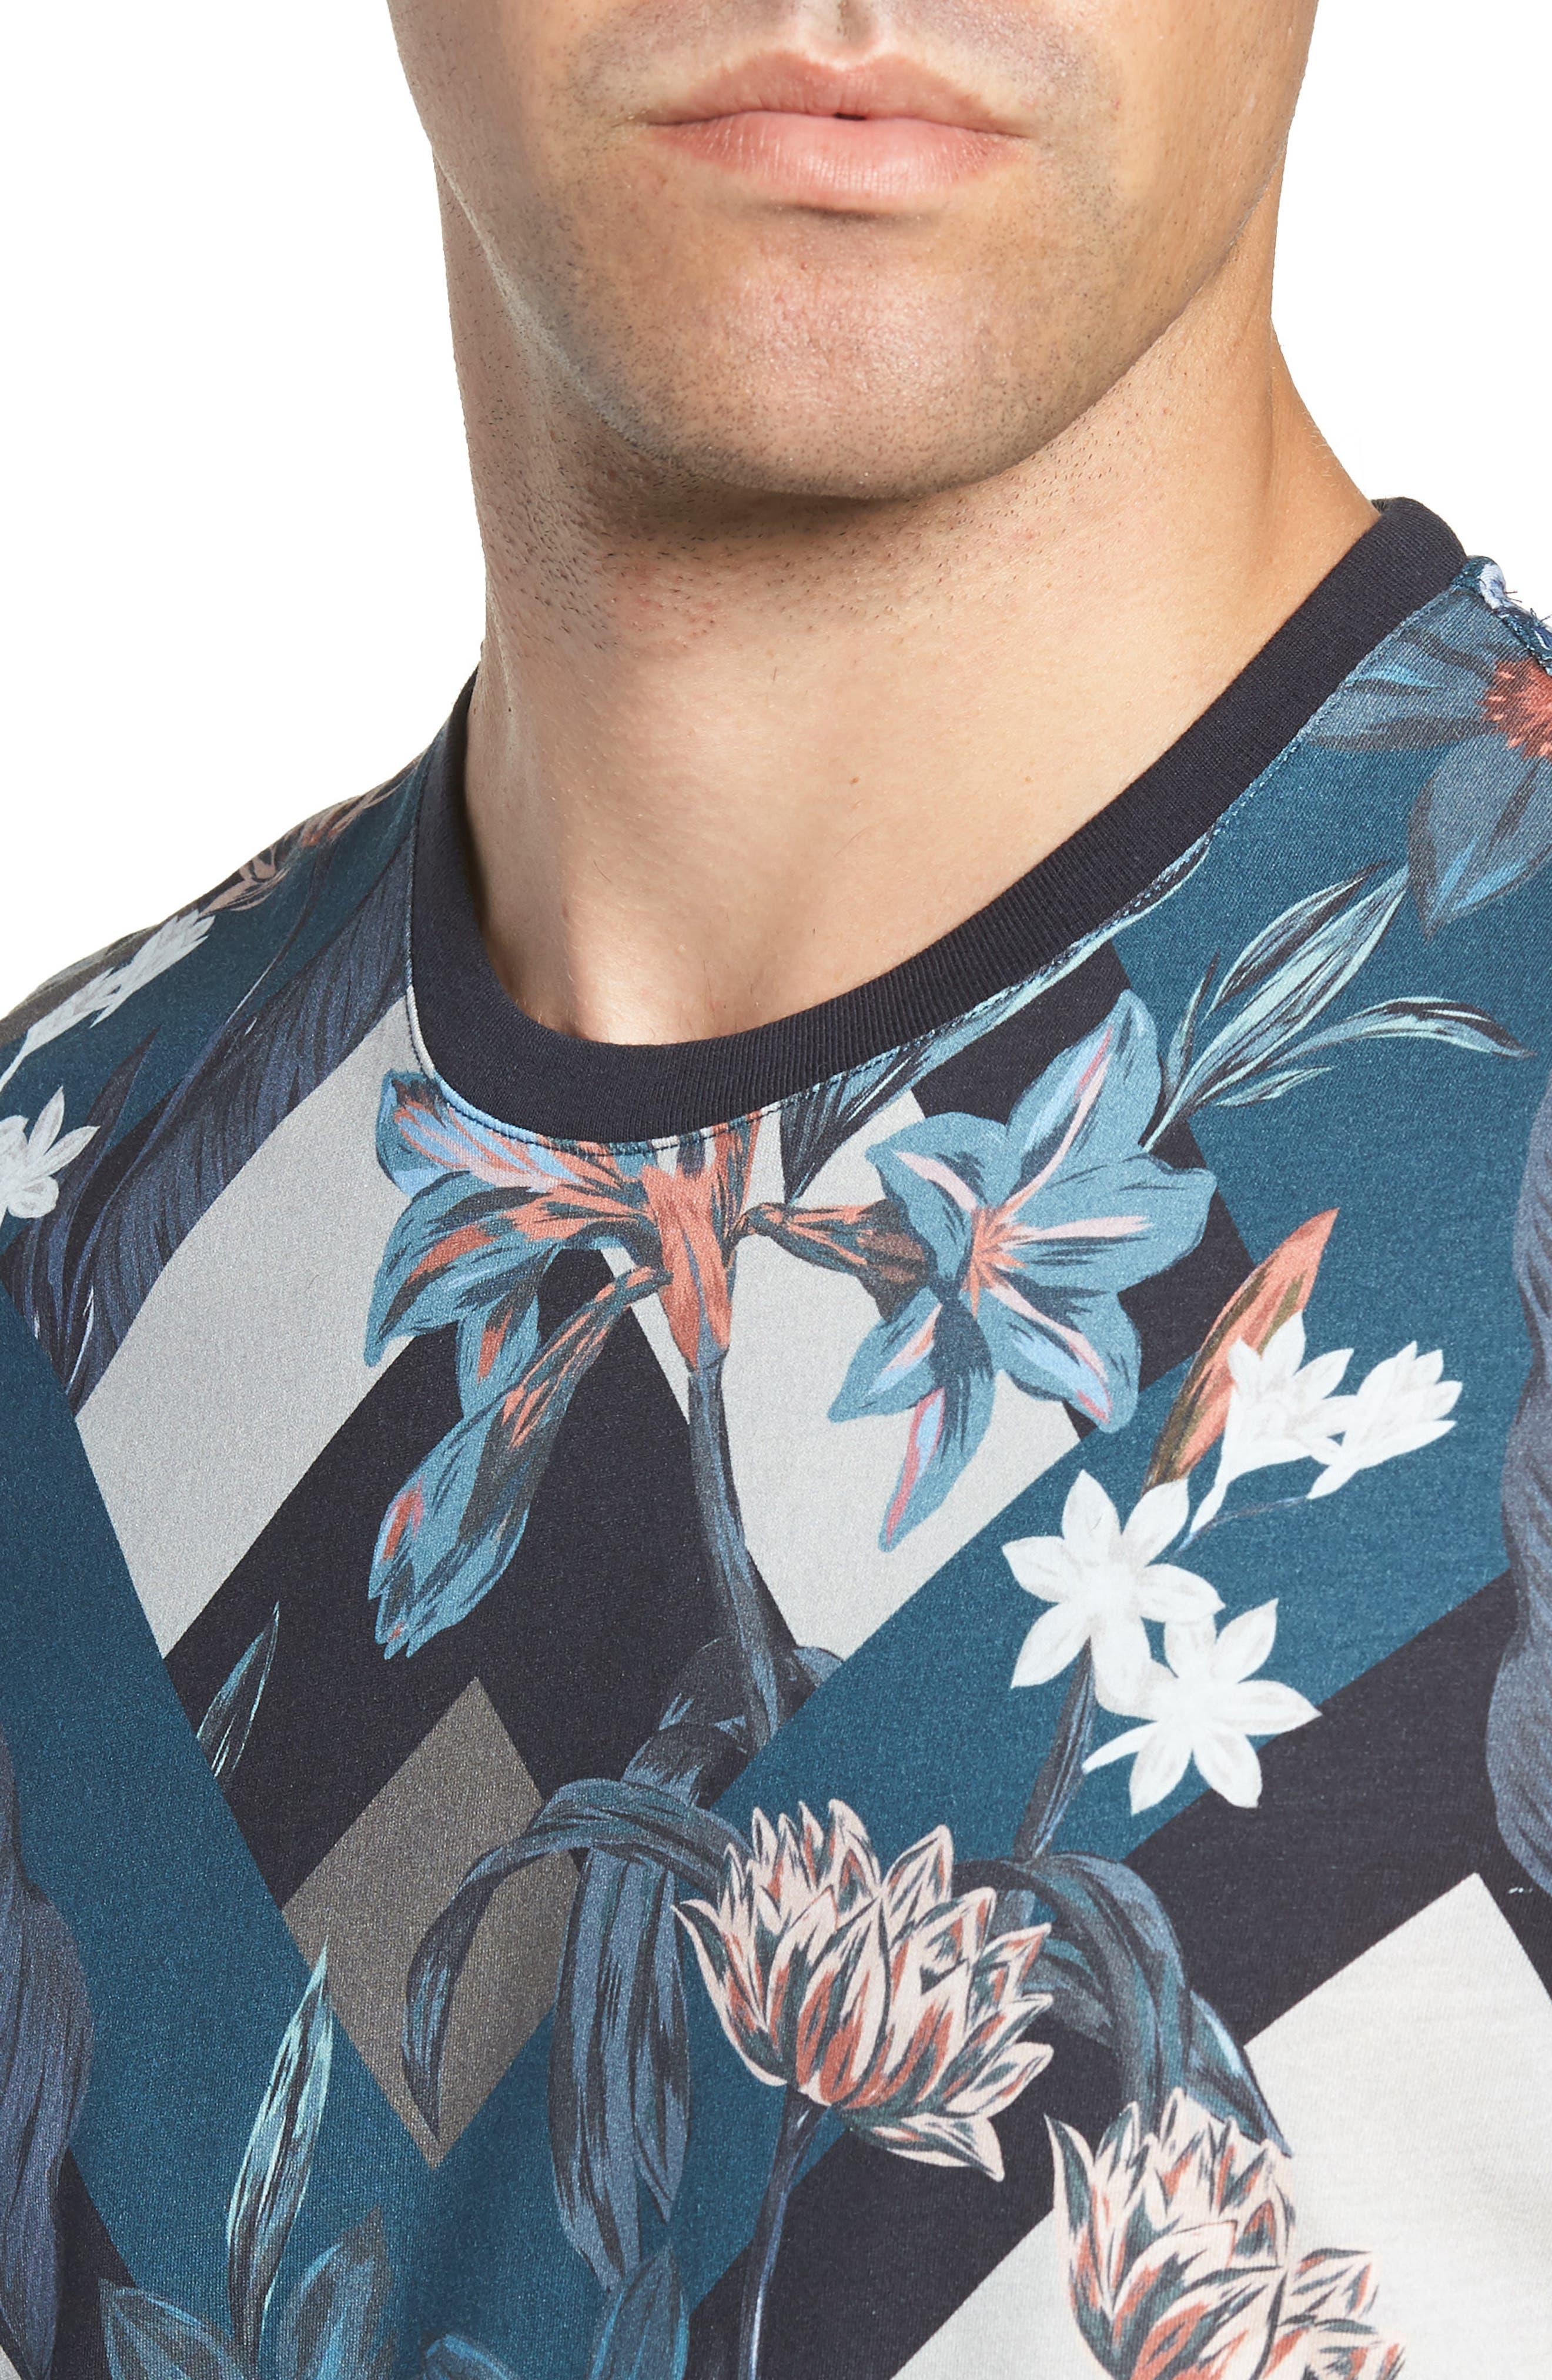 Jolly Slim Fit T-Shirt,                             Alternate thumbnail 4, color,                             NAVY